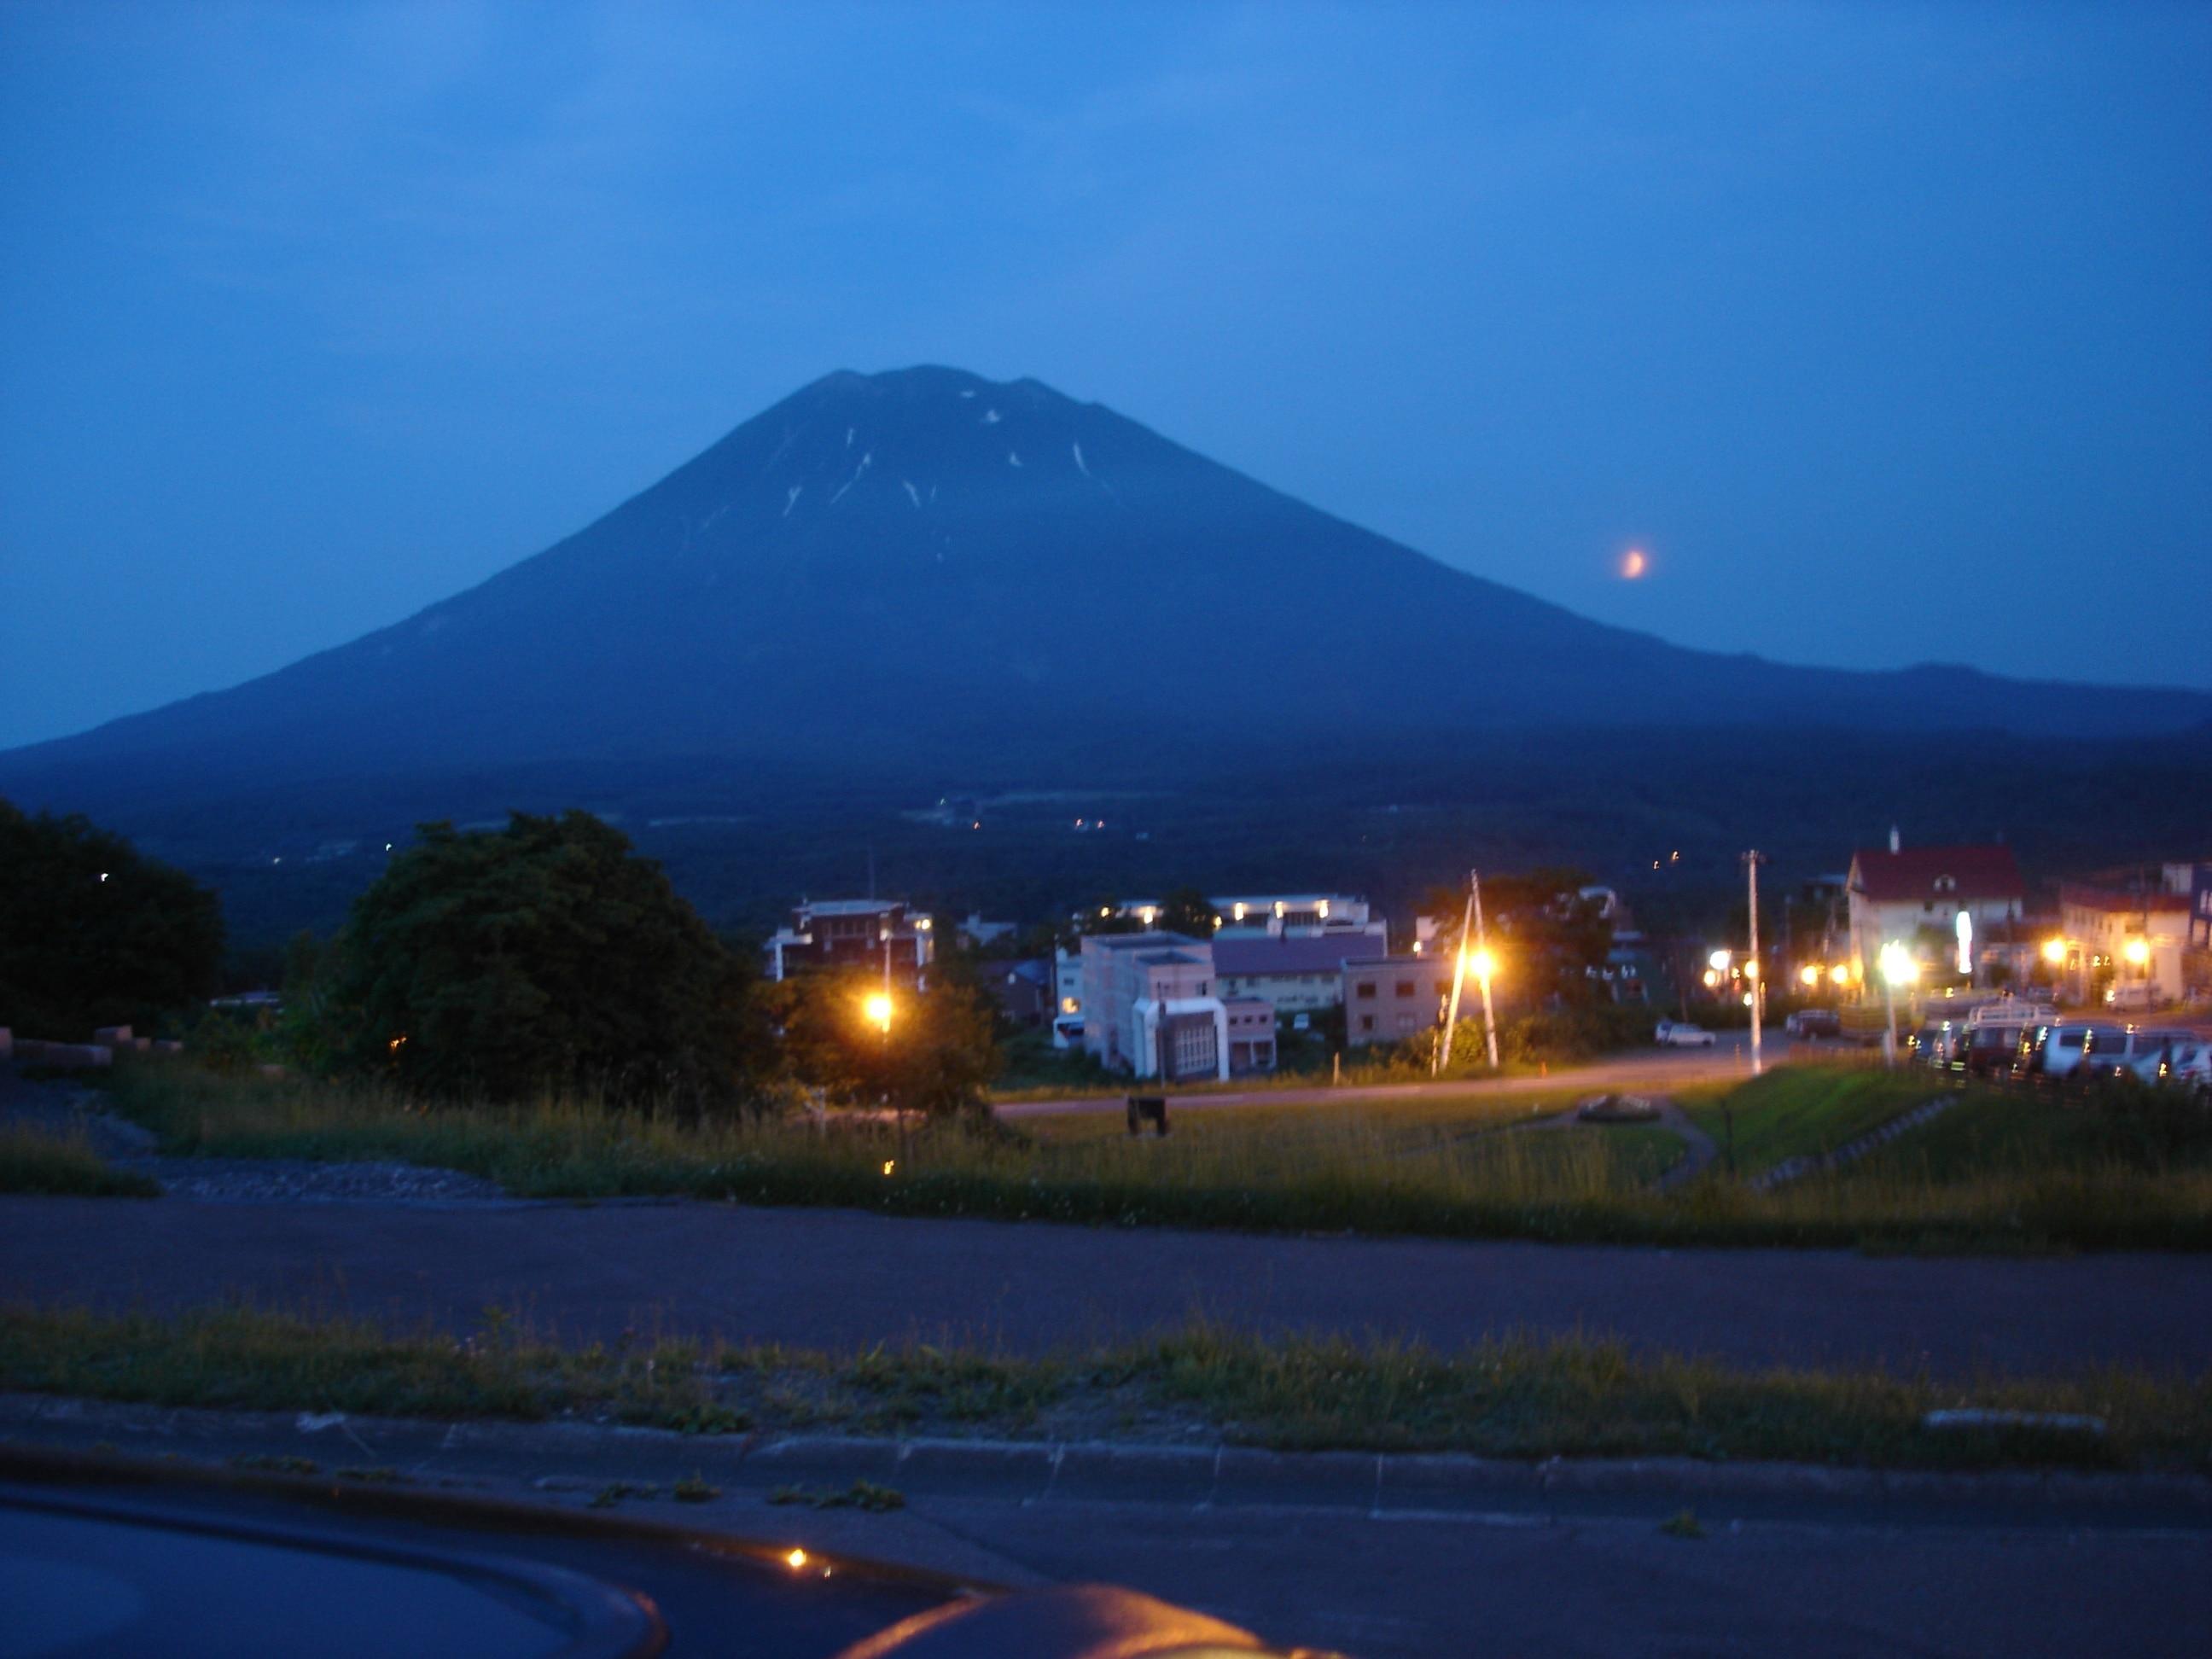 Kabayama, Kutchan, Hokkaido Prefecture, Japan